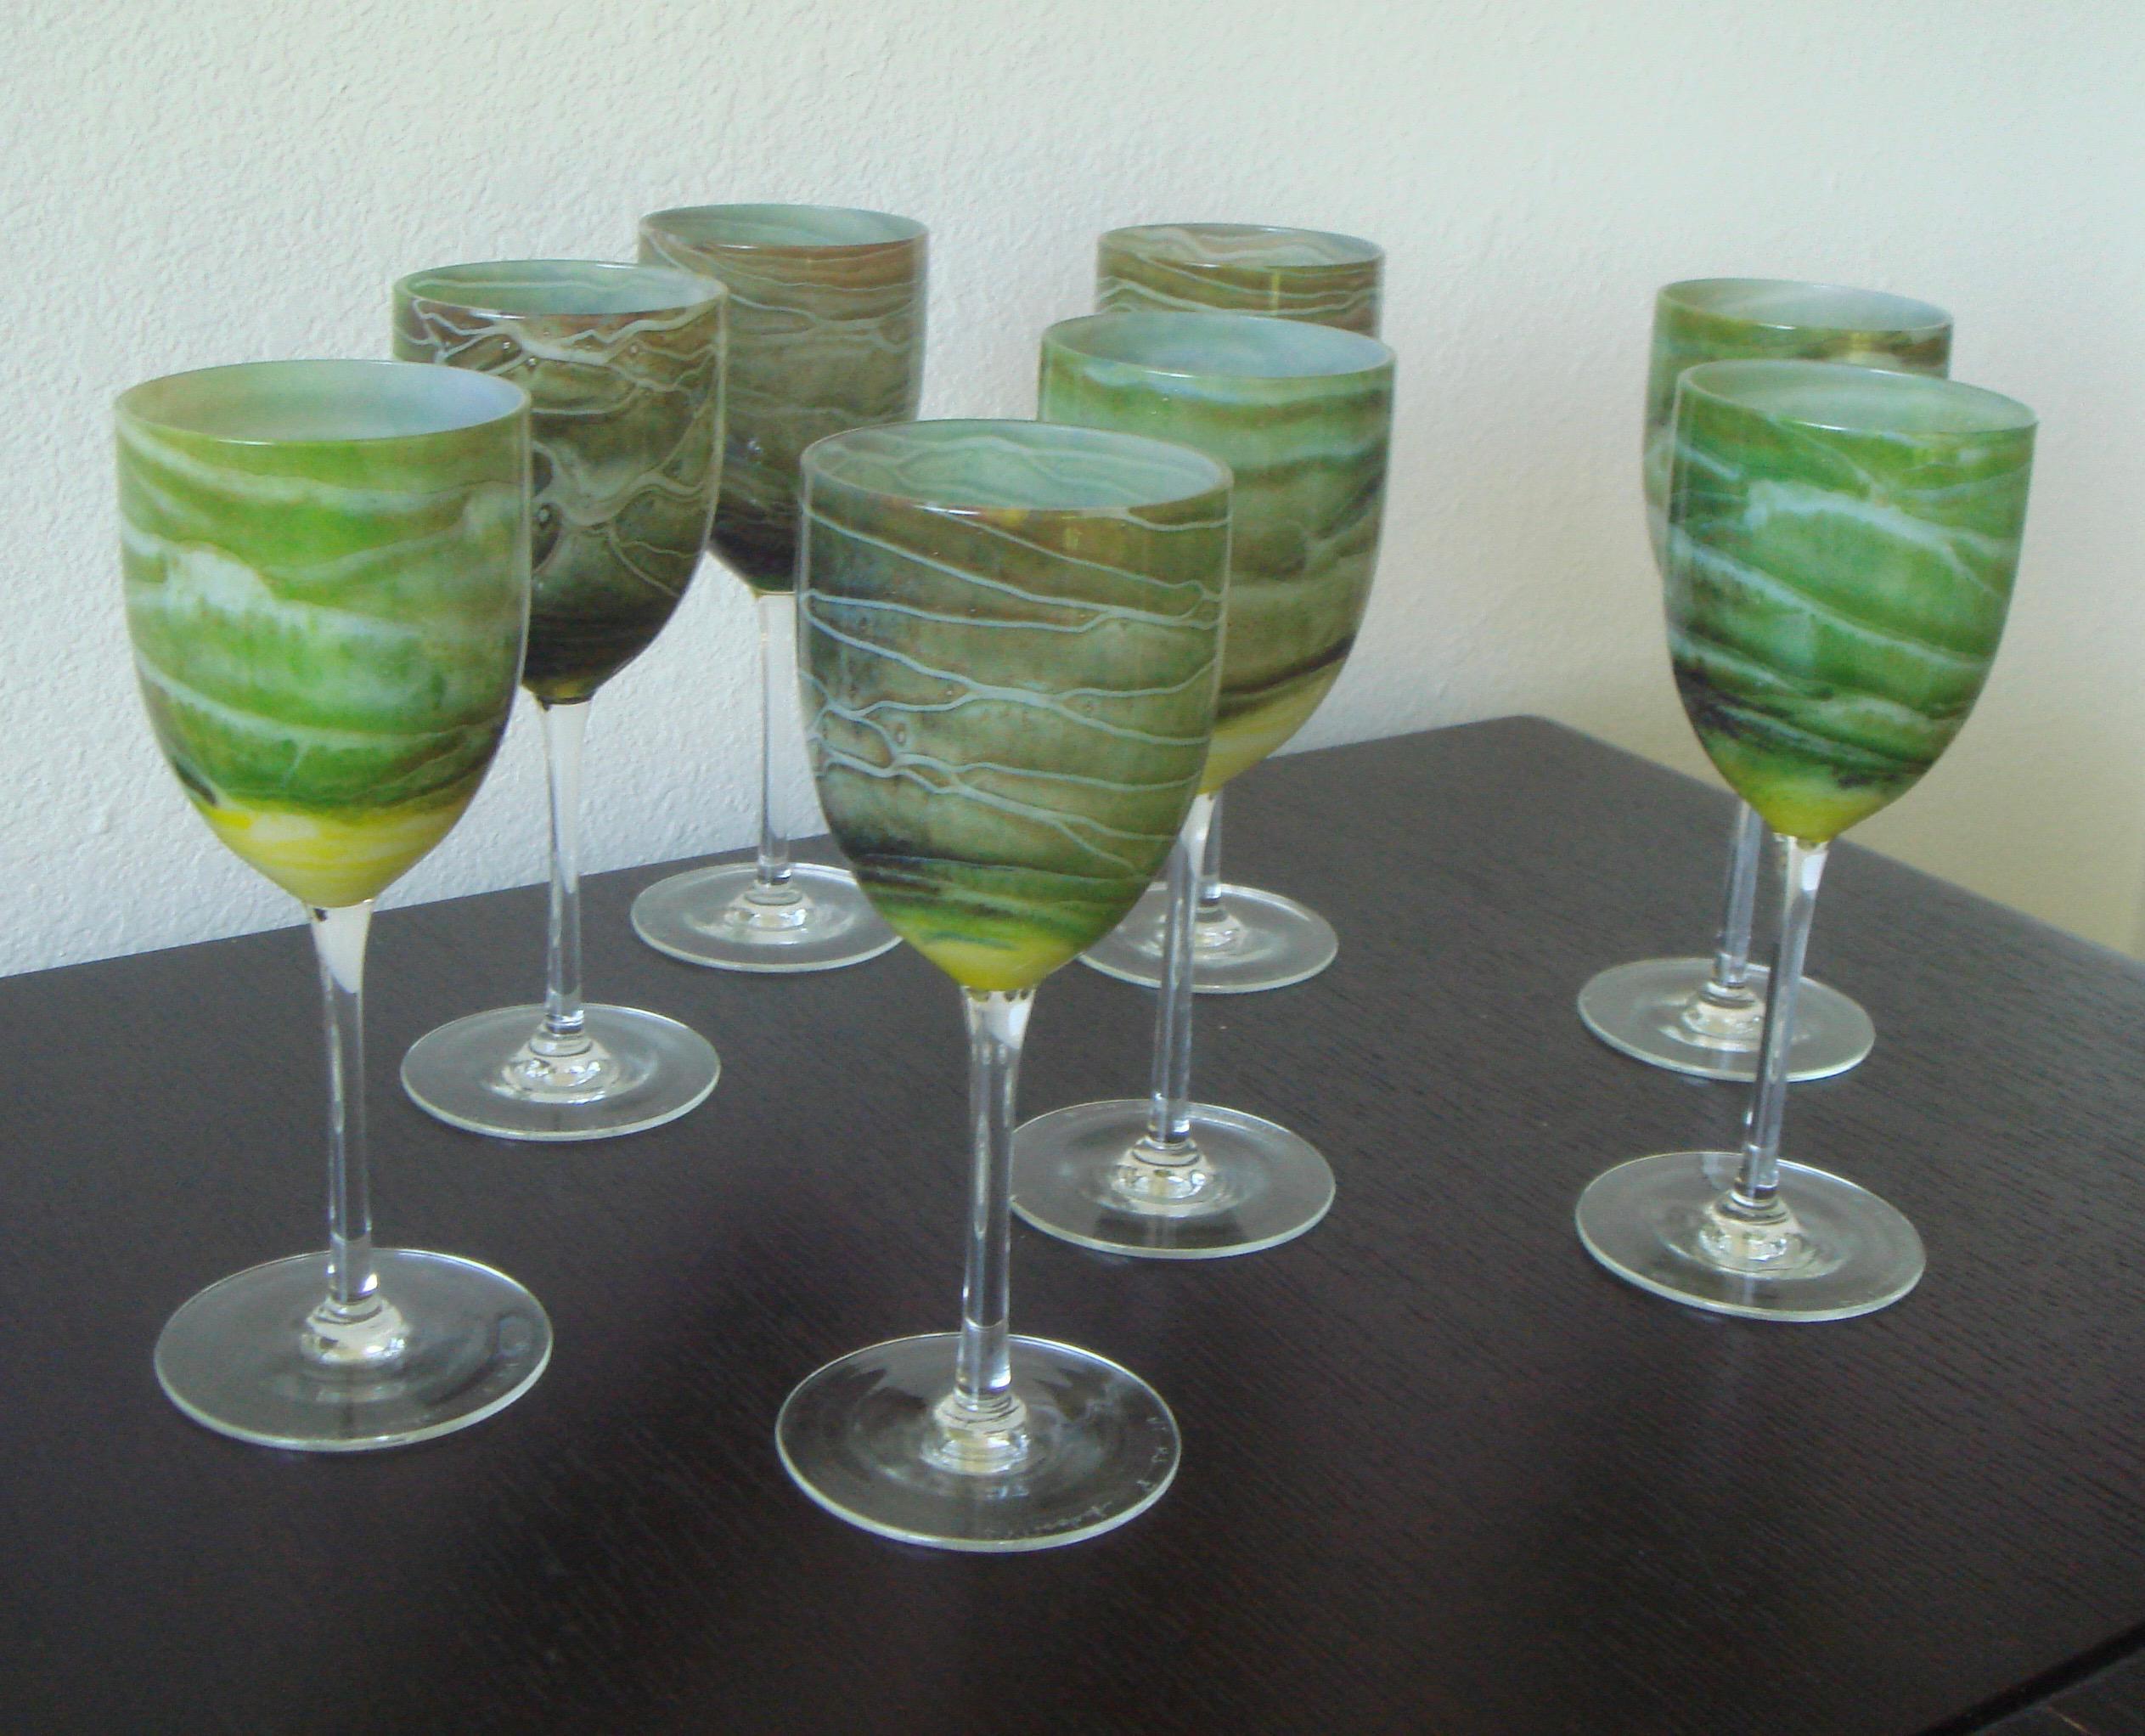 Nice Steven Maslach Handblown Wine Glasses   Set Of 8   Image 9 Of 10